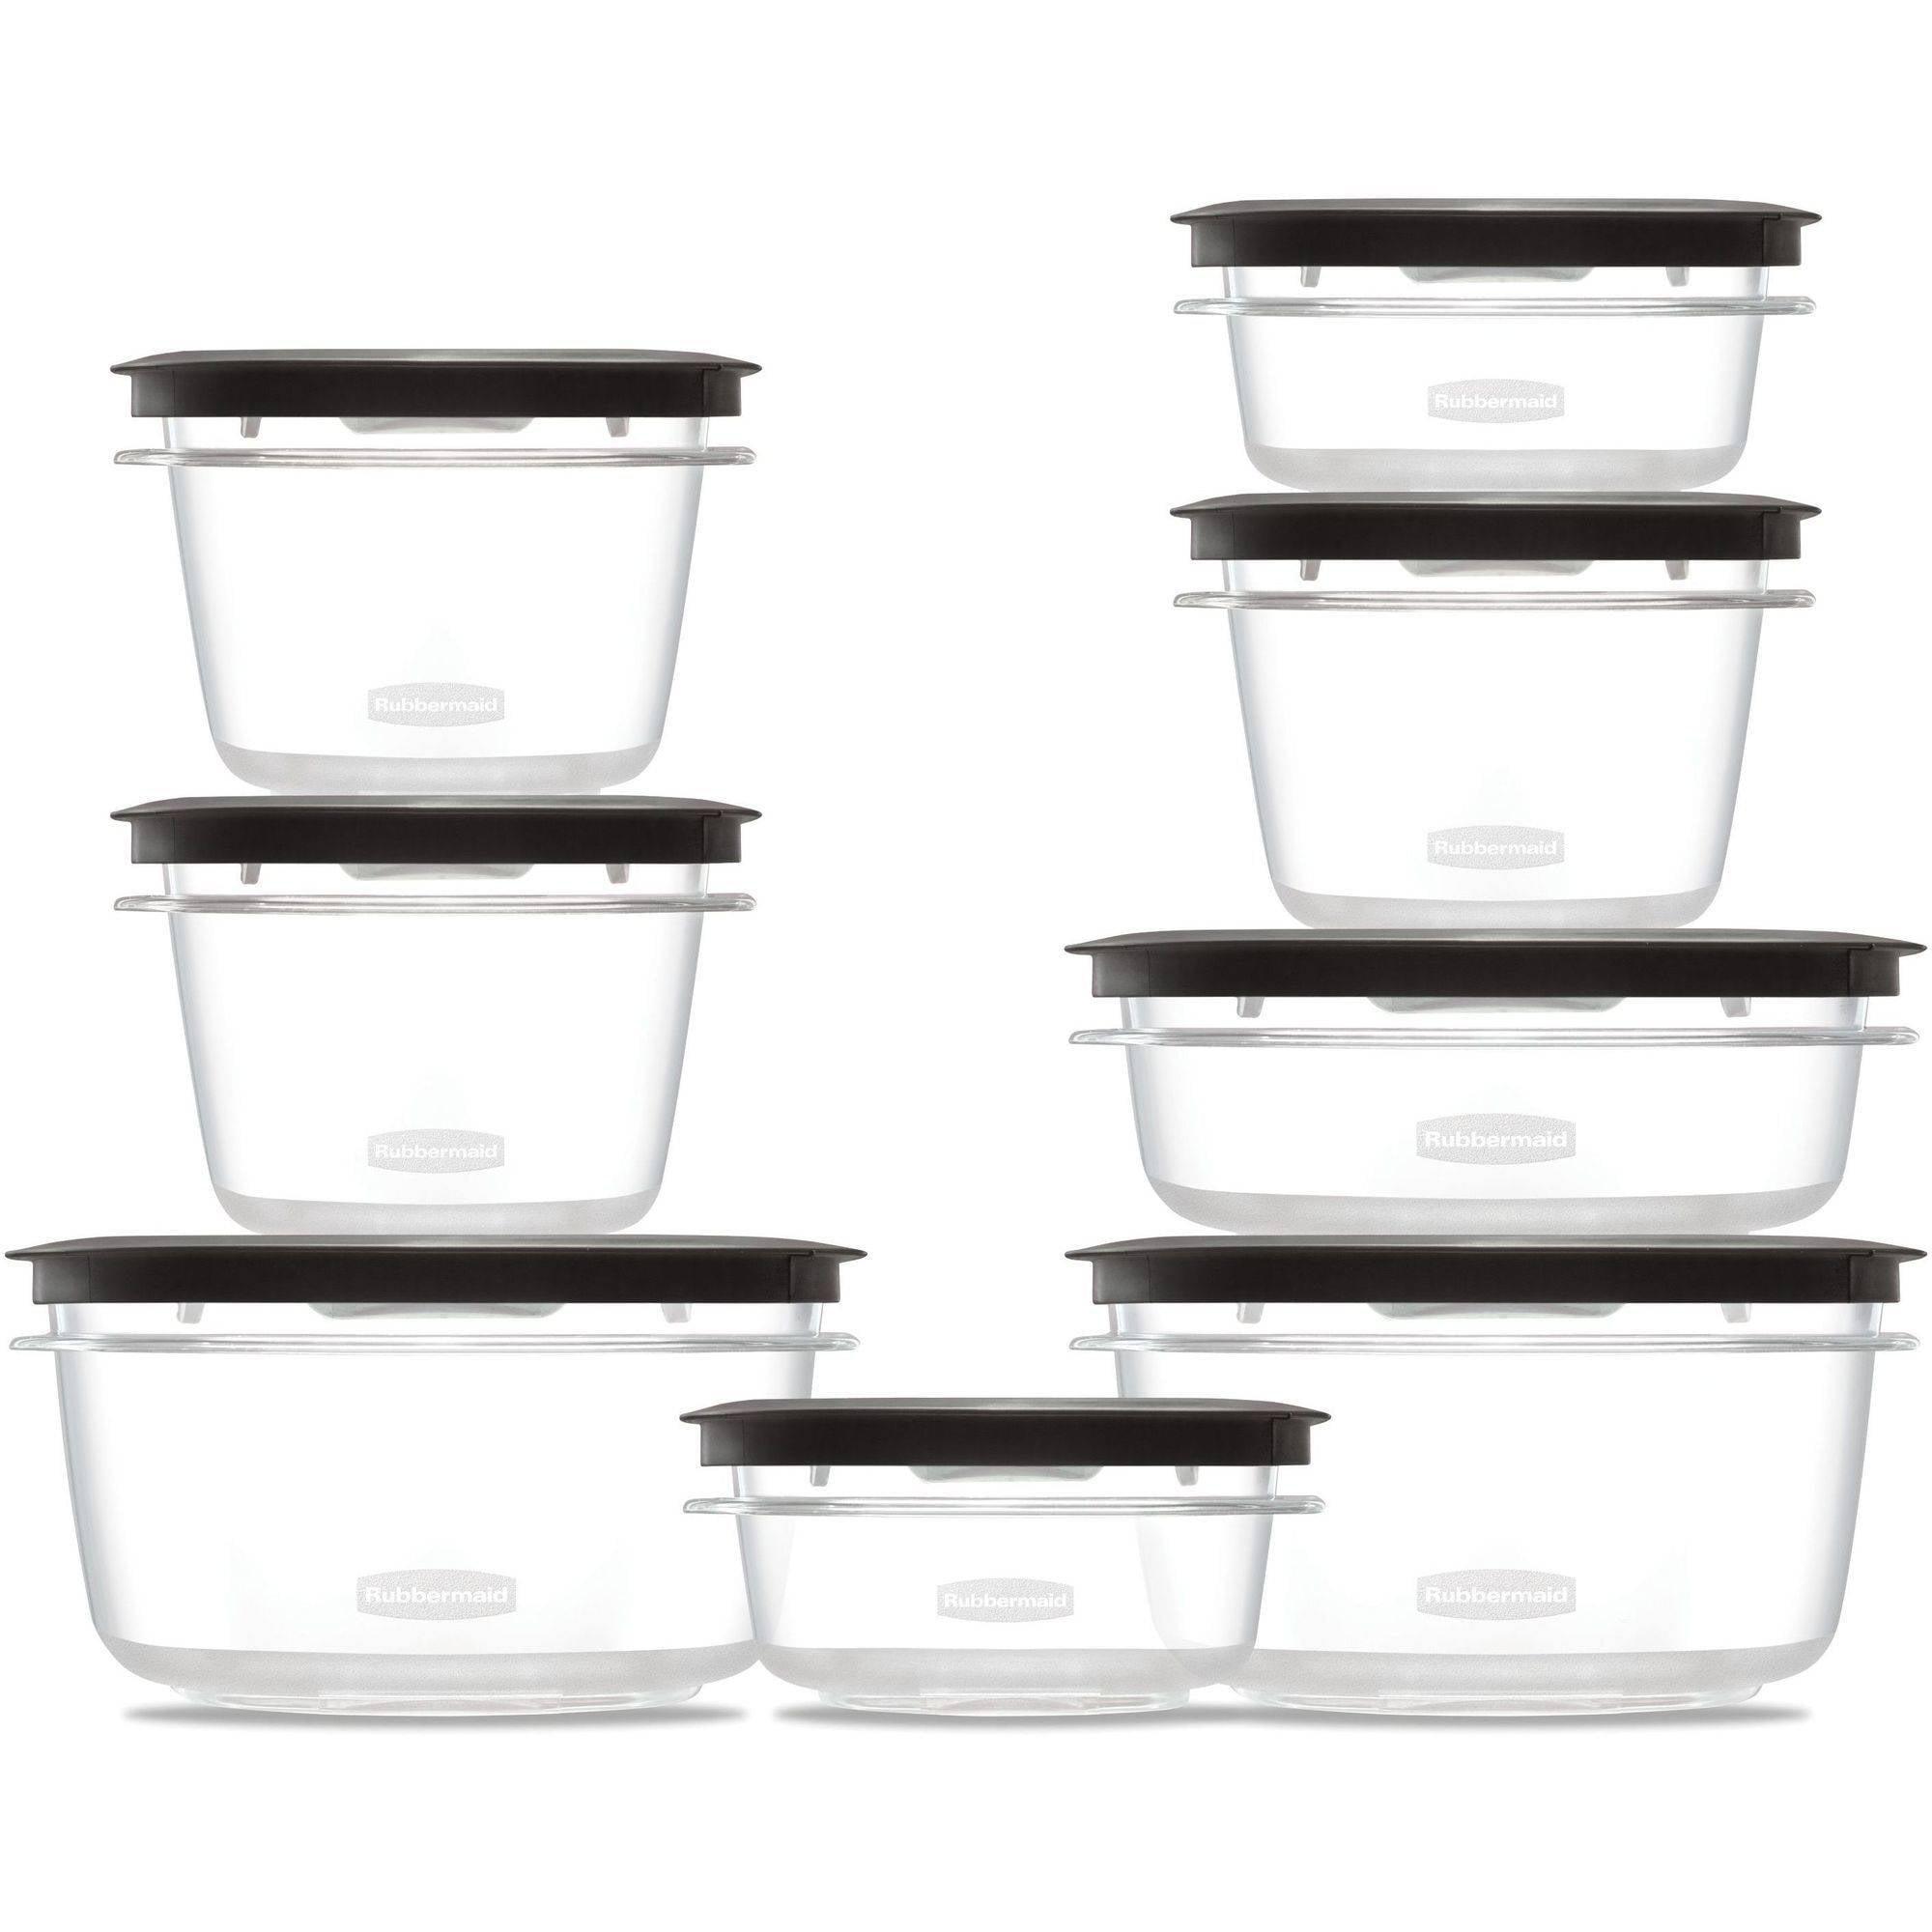 Rubbermaid Premier Food Storage Container, 16-Piece Set